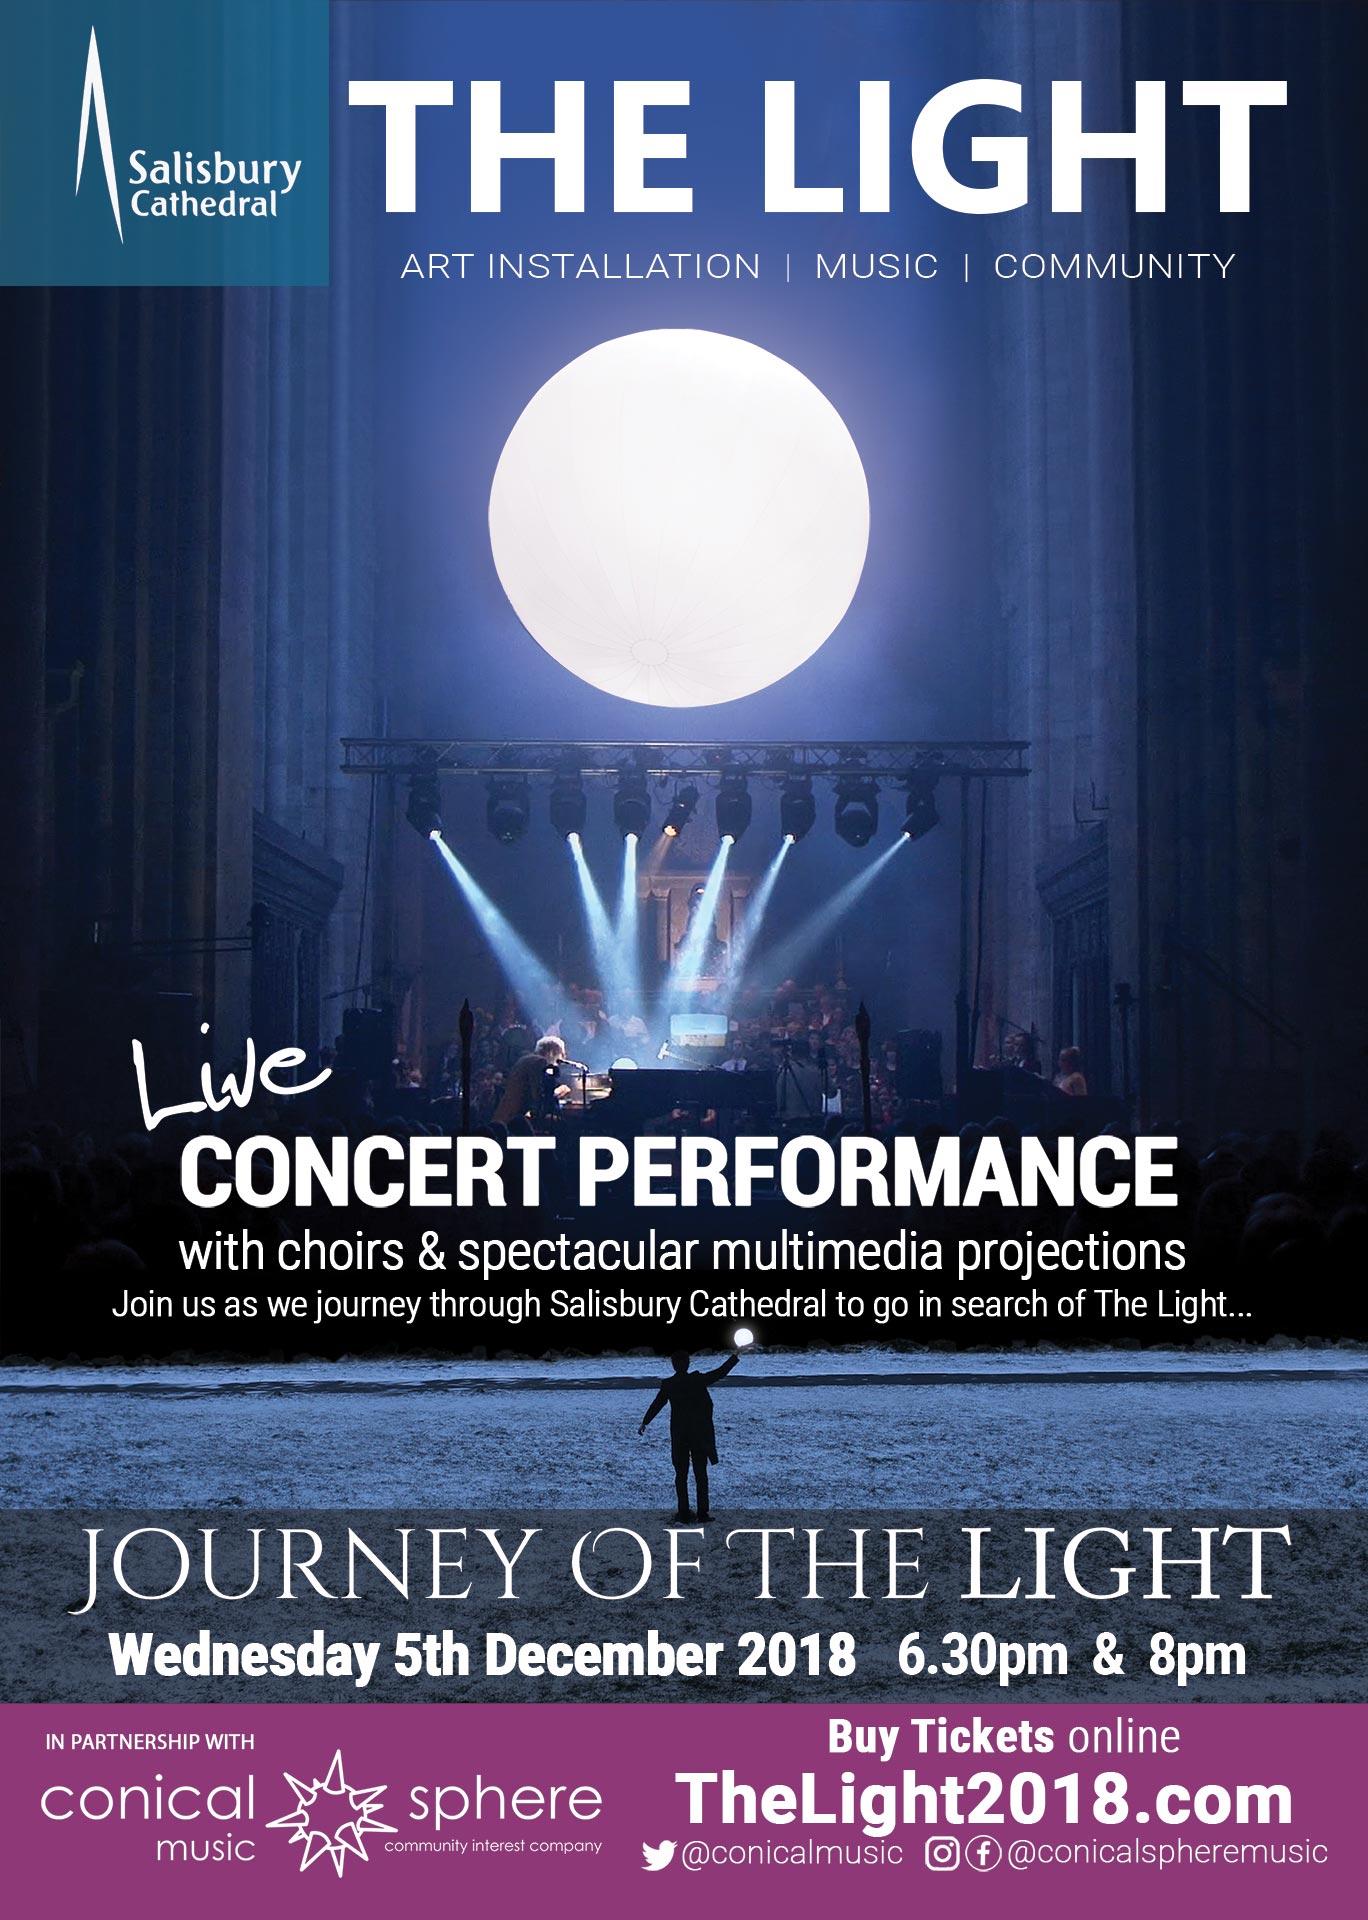 The Light, Salisbury